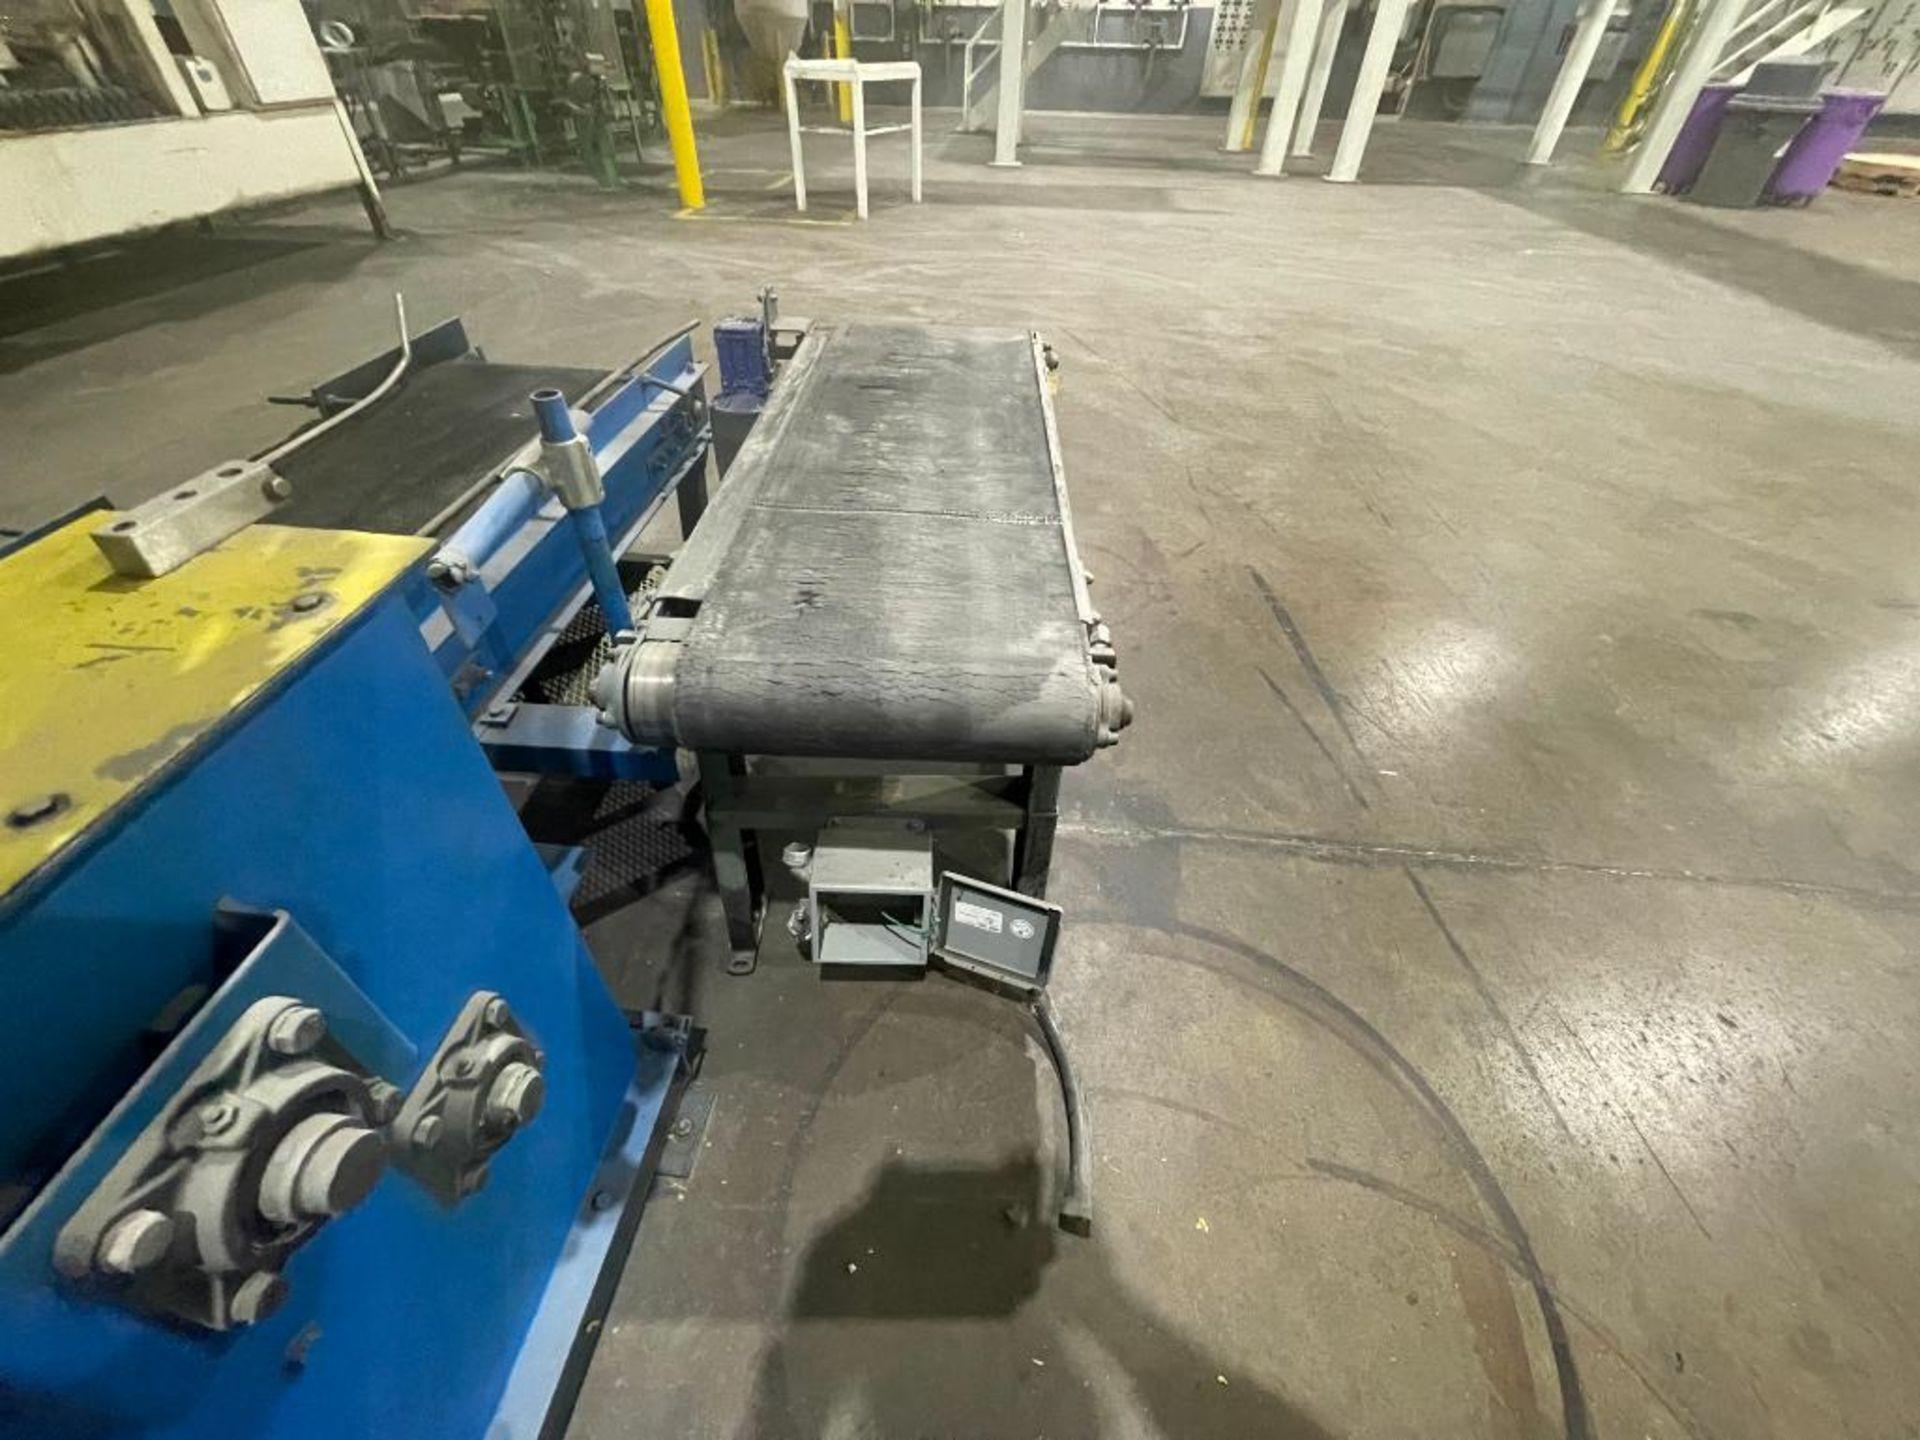 Hytrol mild steel conveyor - Image 8 of 10